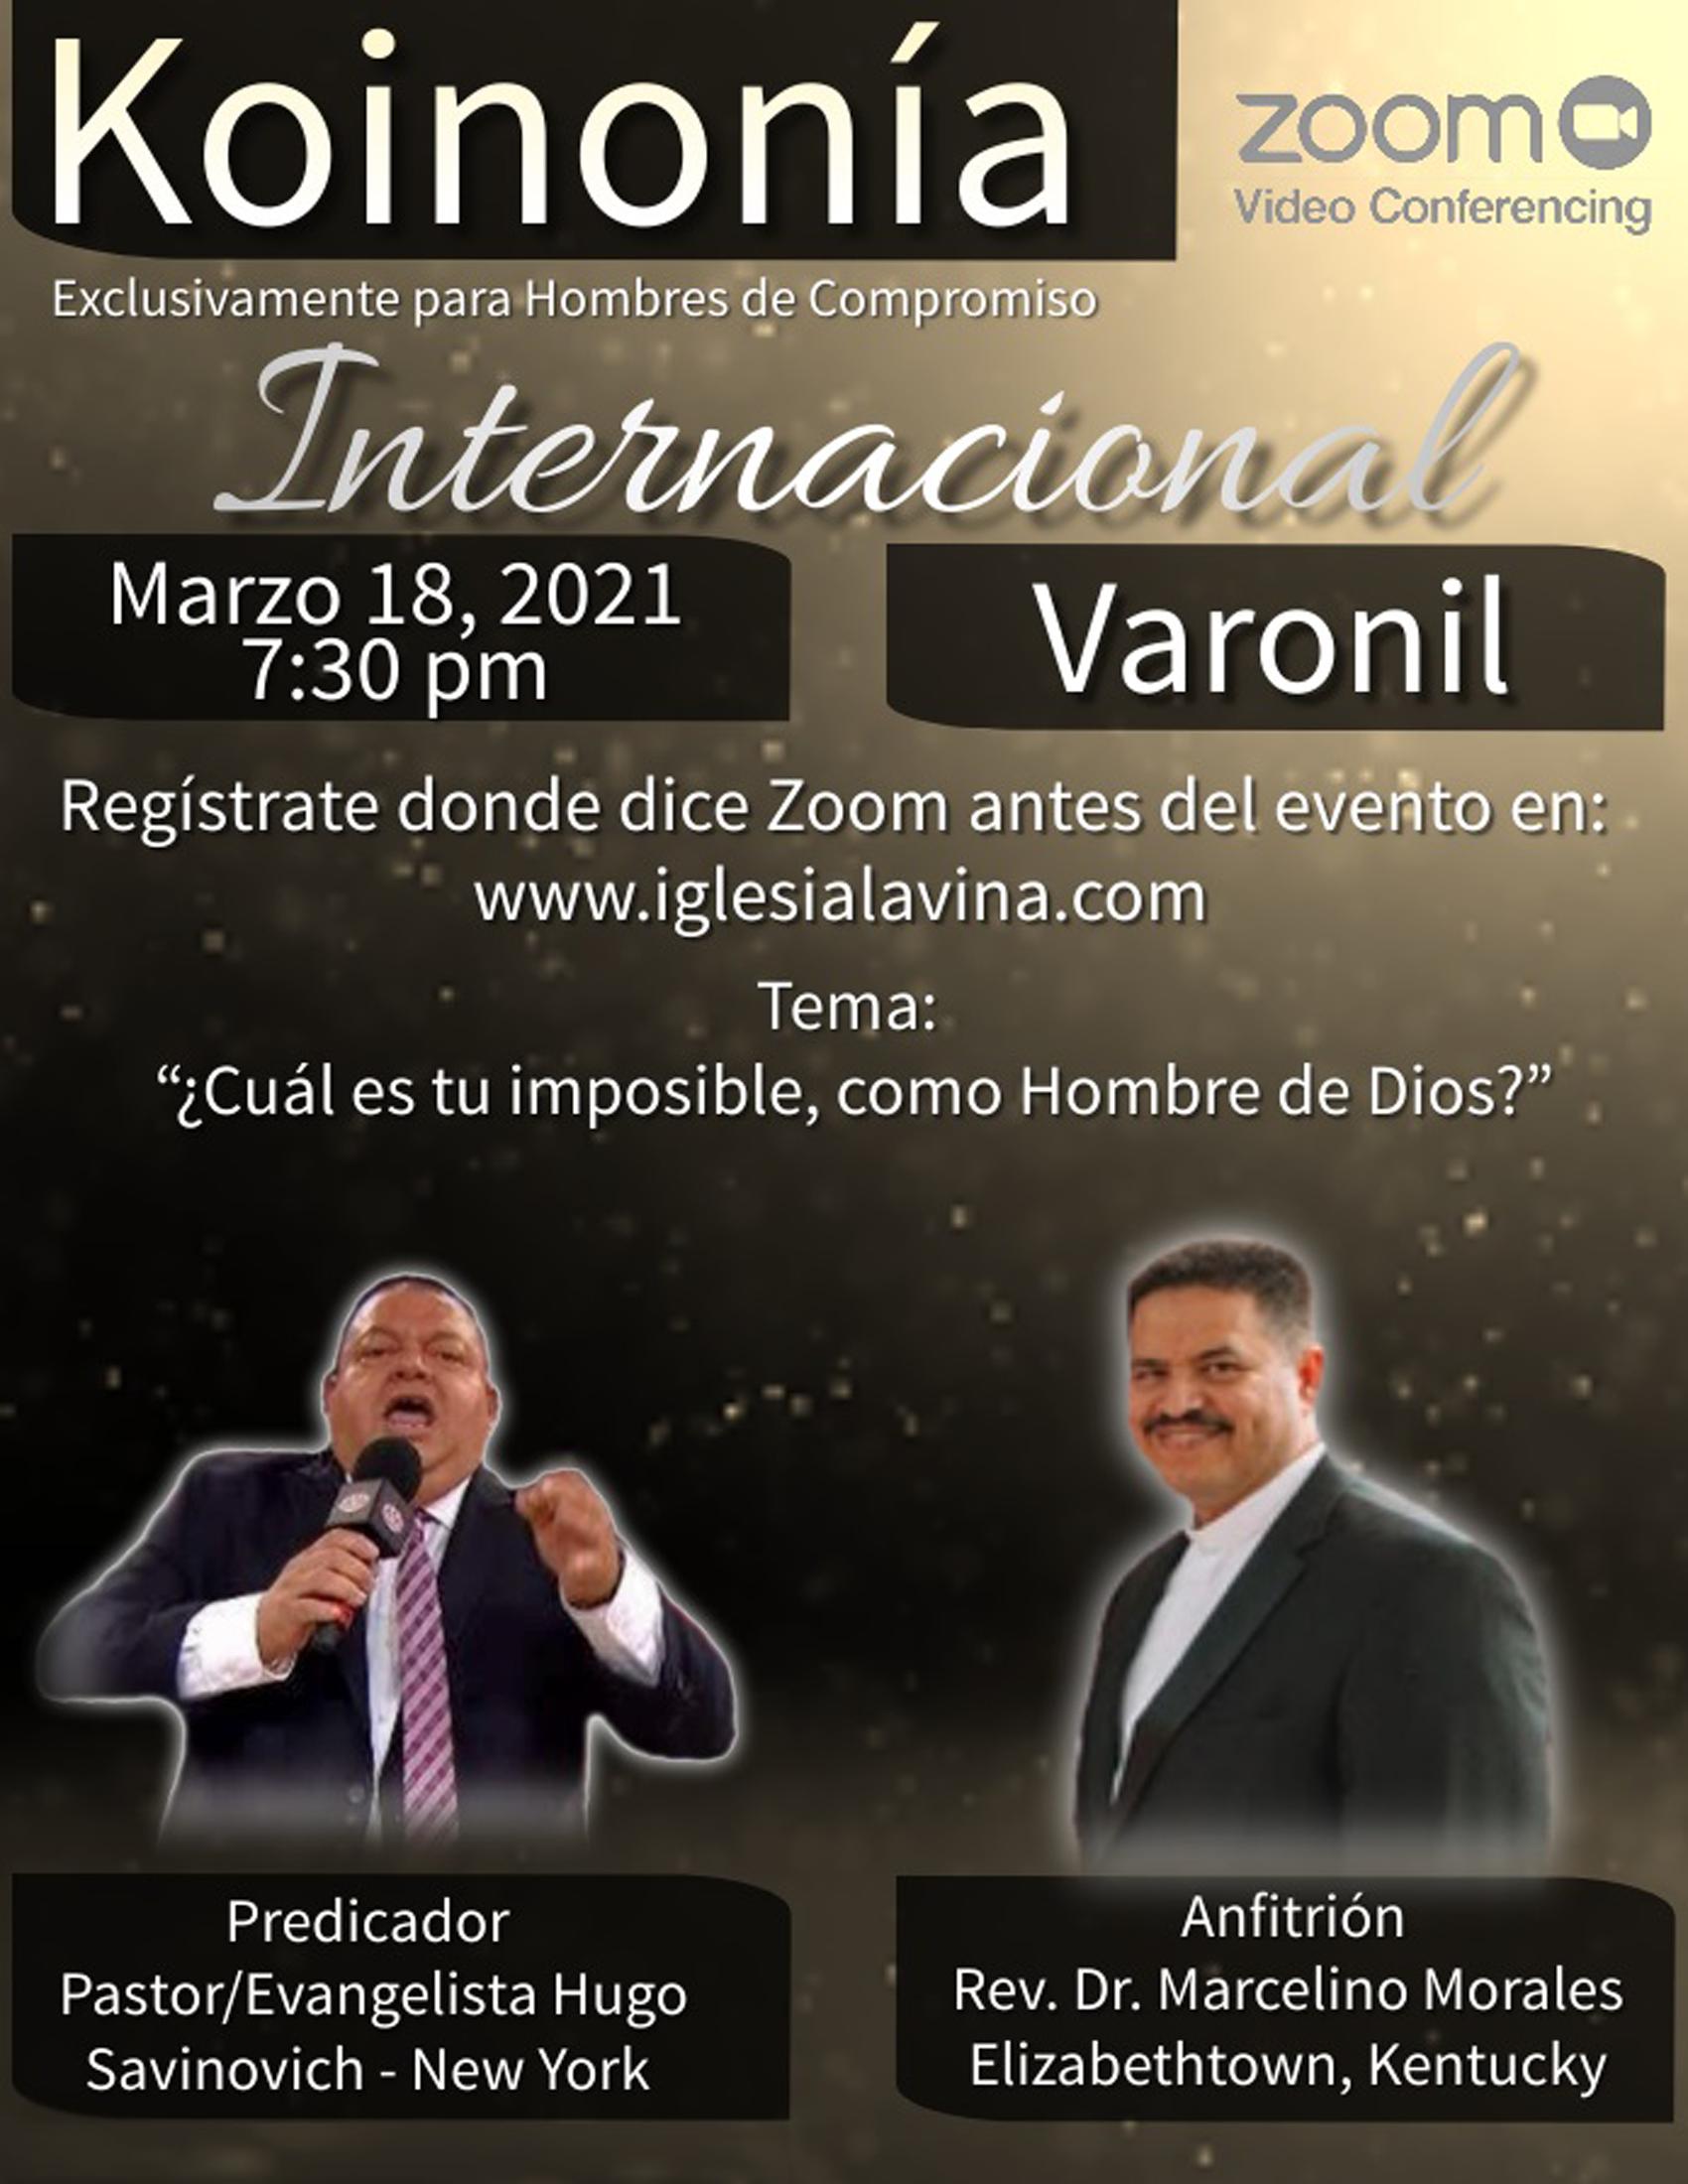 Koinonía 3-18-2021 - Pastor-Evangelista